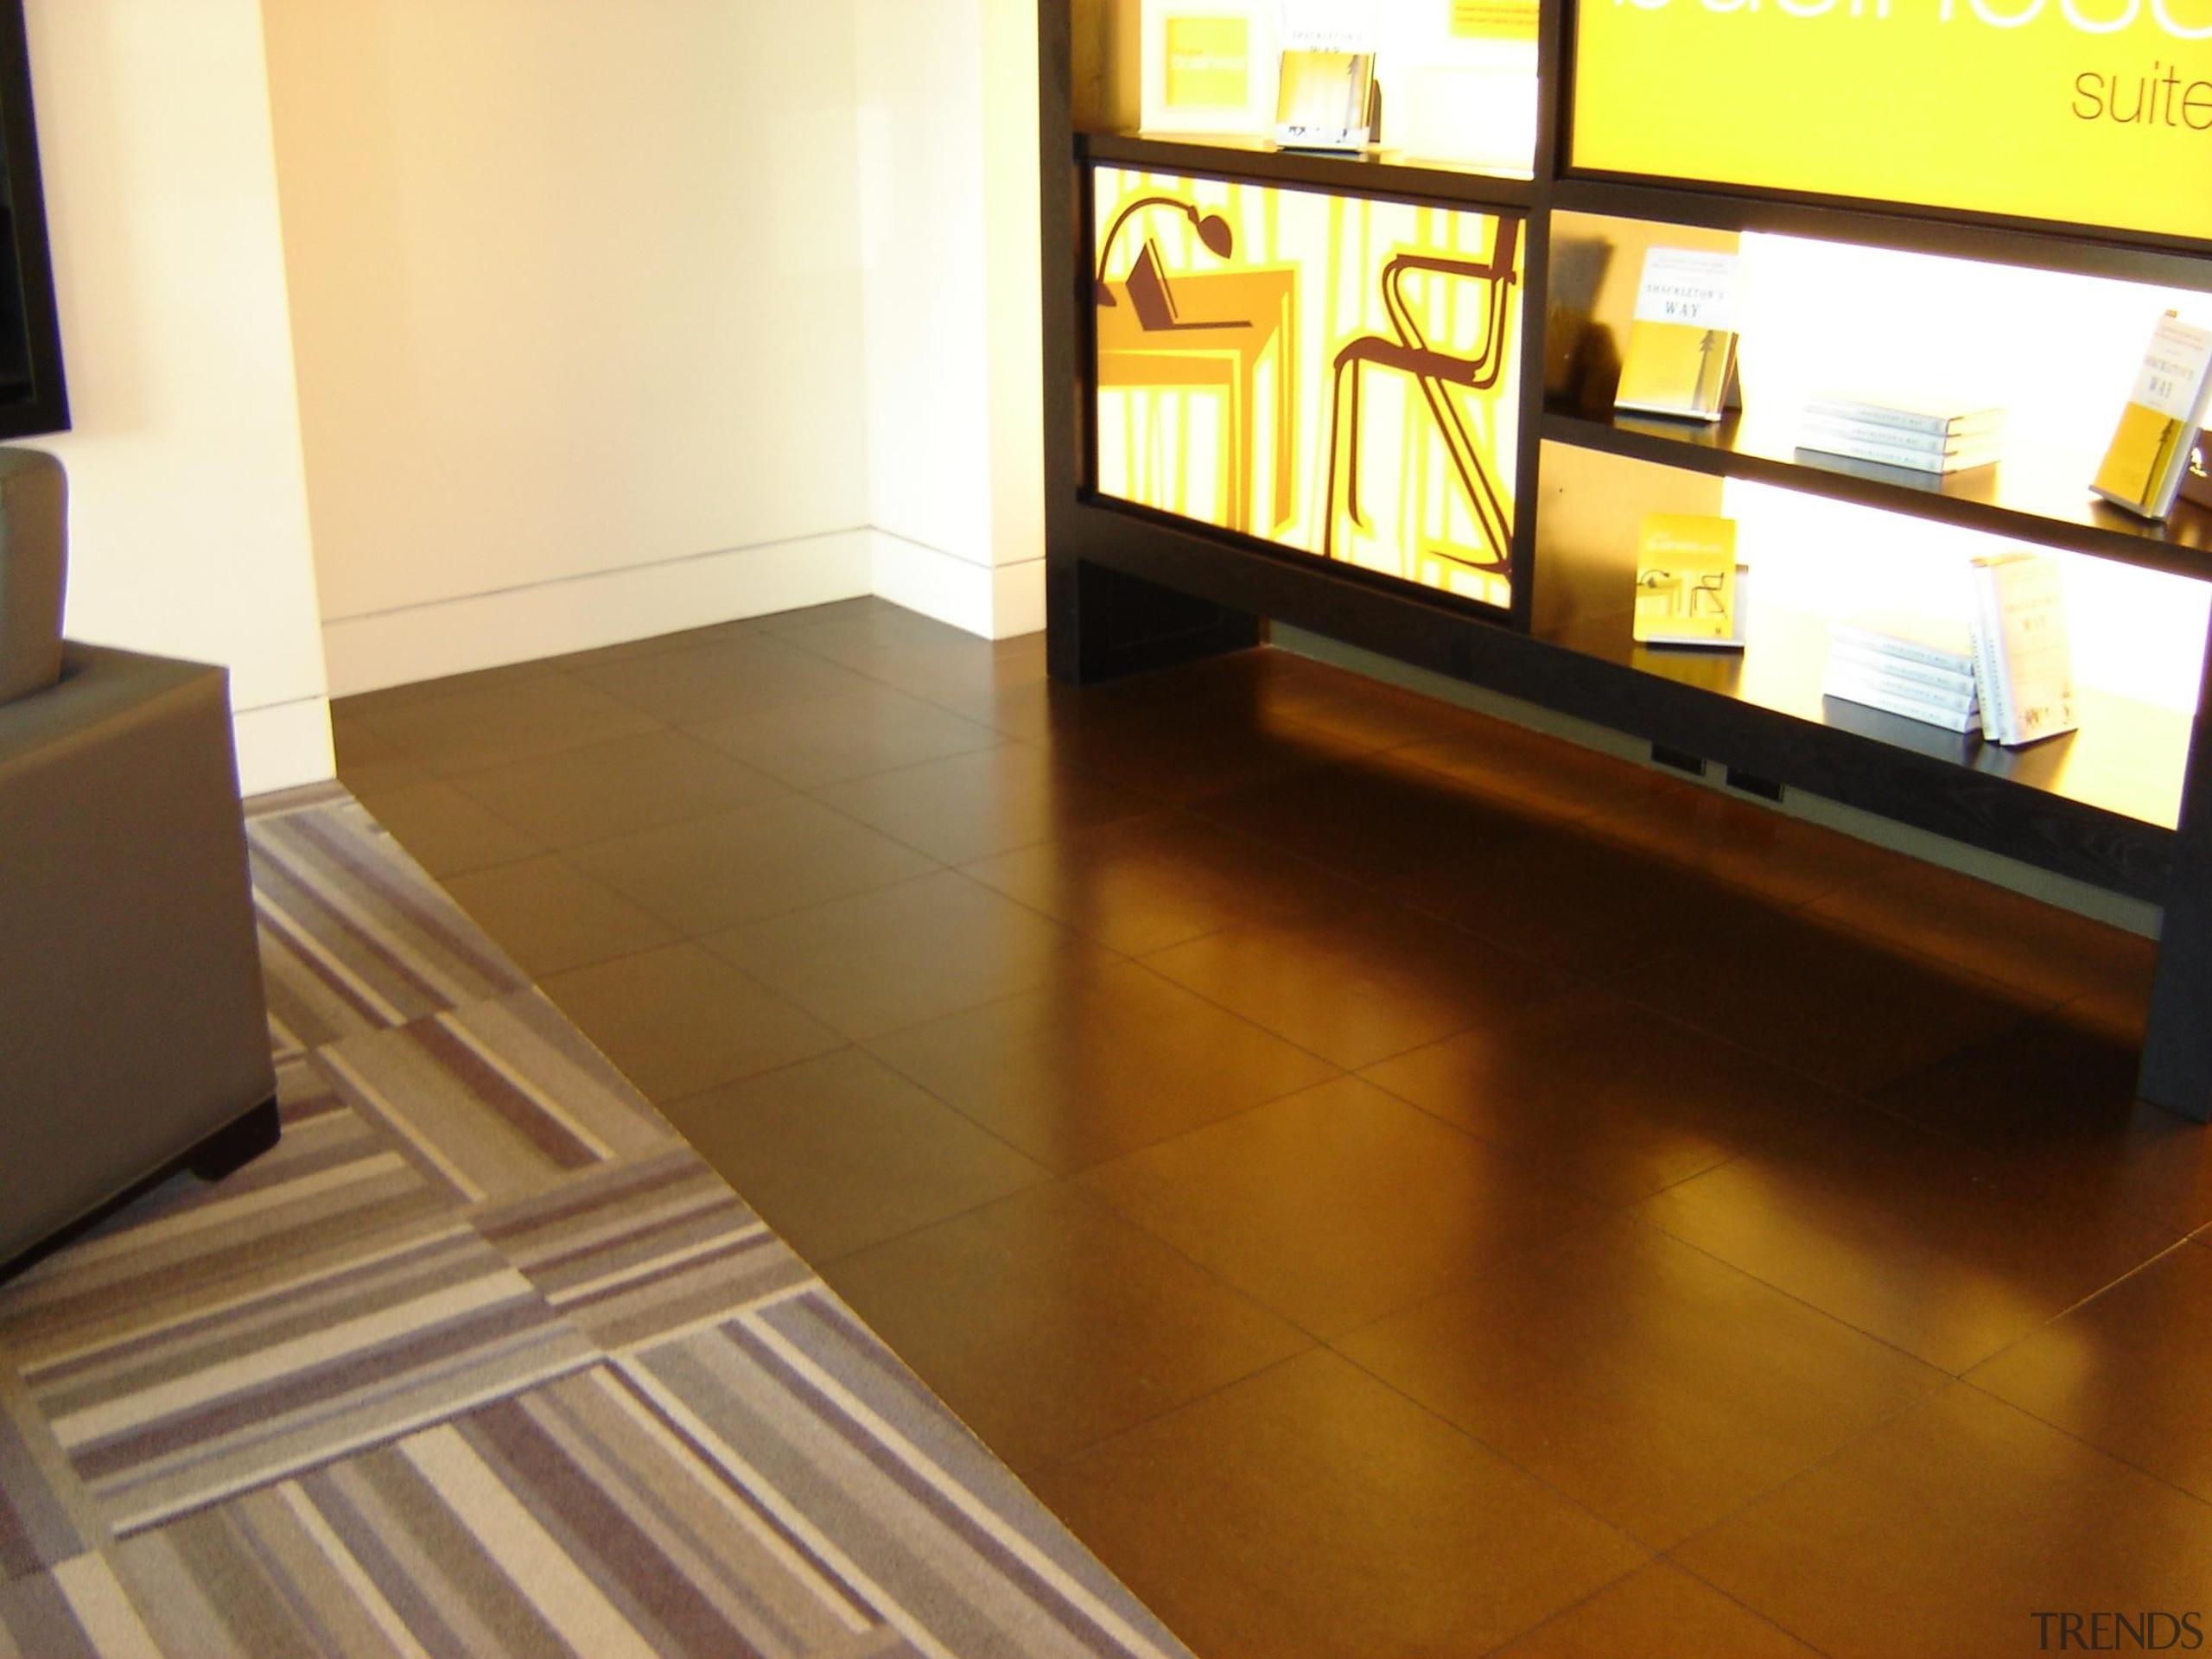 Cork Concepts provides luxury eco flooring in unlimited floor, flooring, hardwood, interior design, laminate flooring, property, real estate, room, tile, wood, wood flooring, wood stain, brown